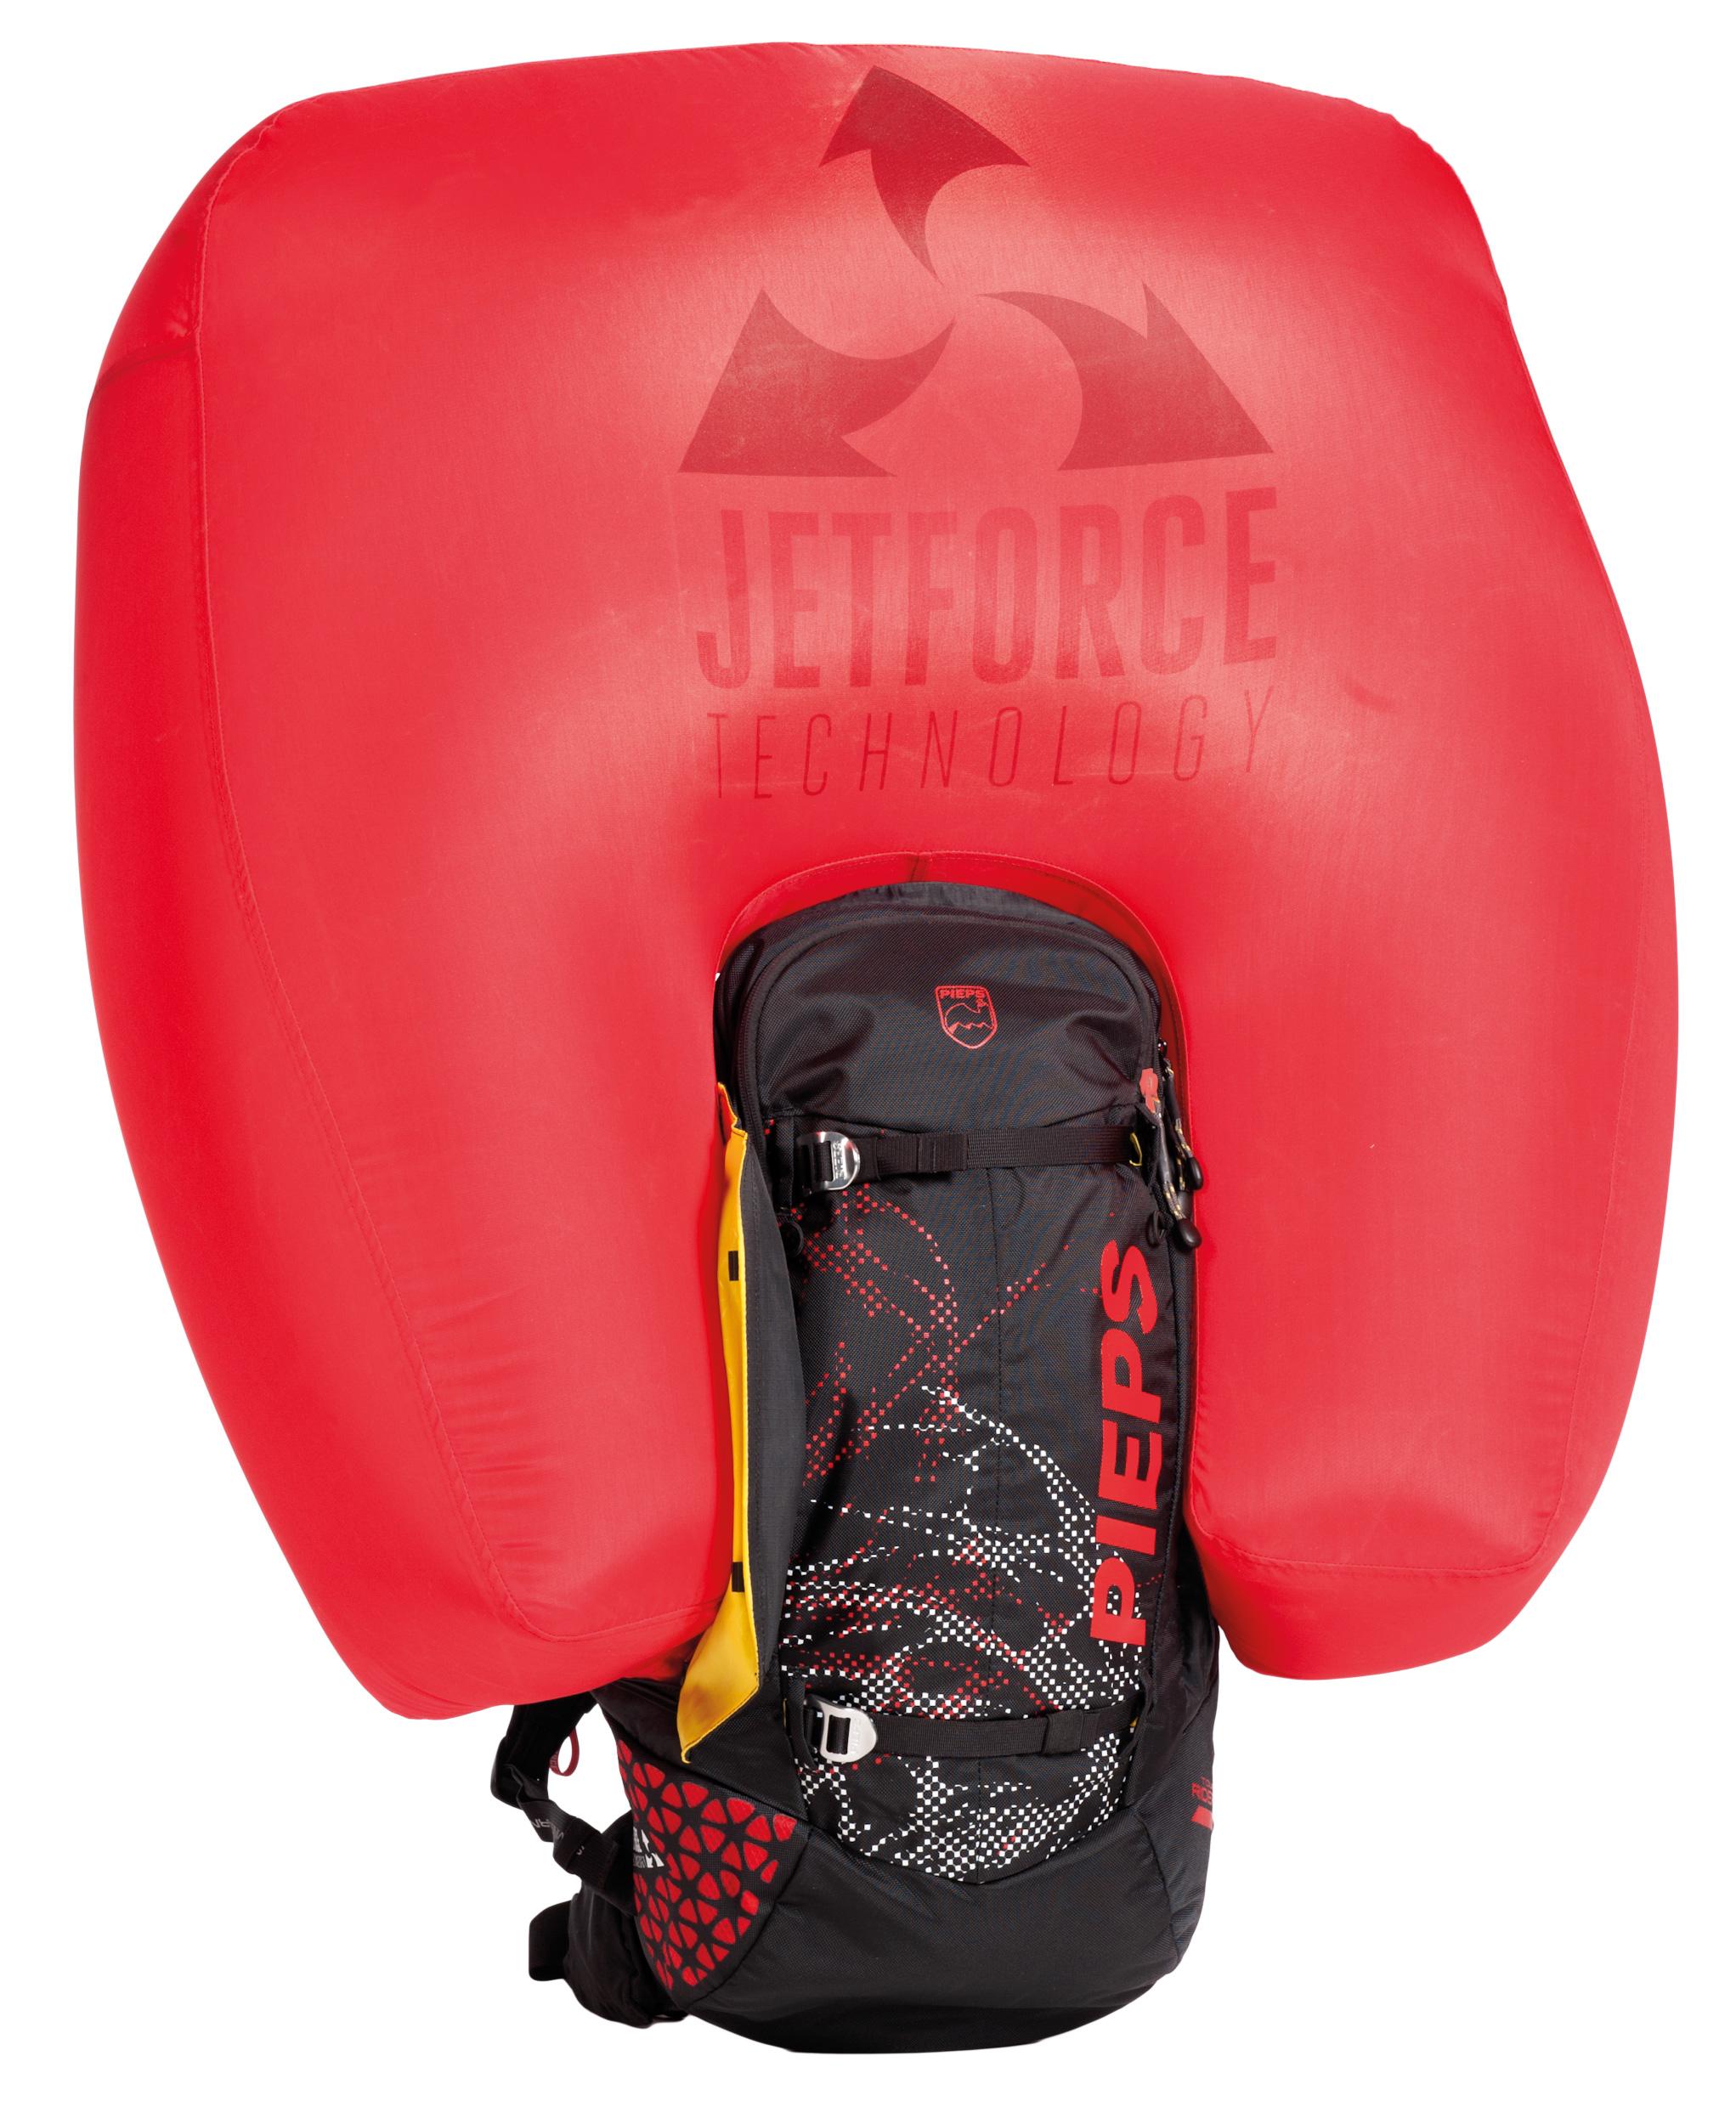 Pieps Jetforce Tour Pro 34L red